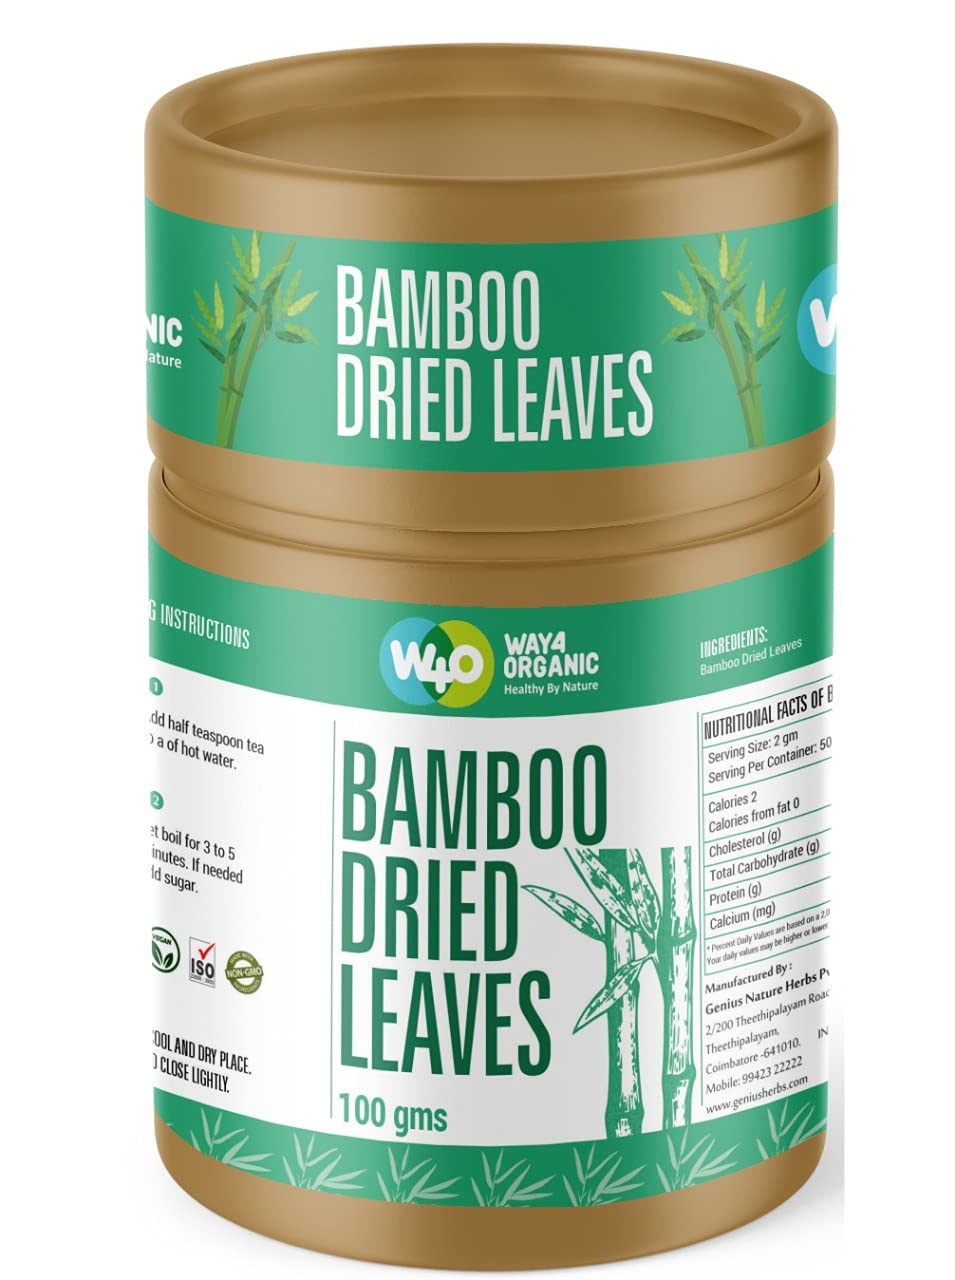 Way4organic Bamboo Dried Leaves